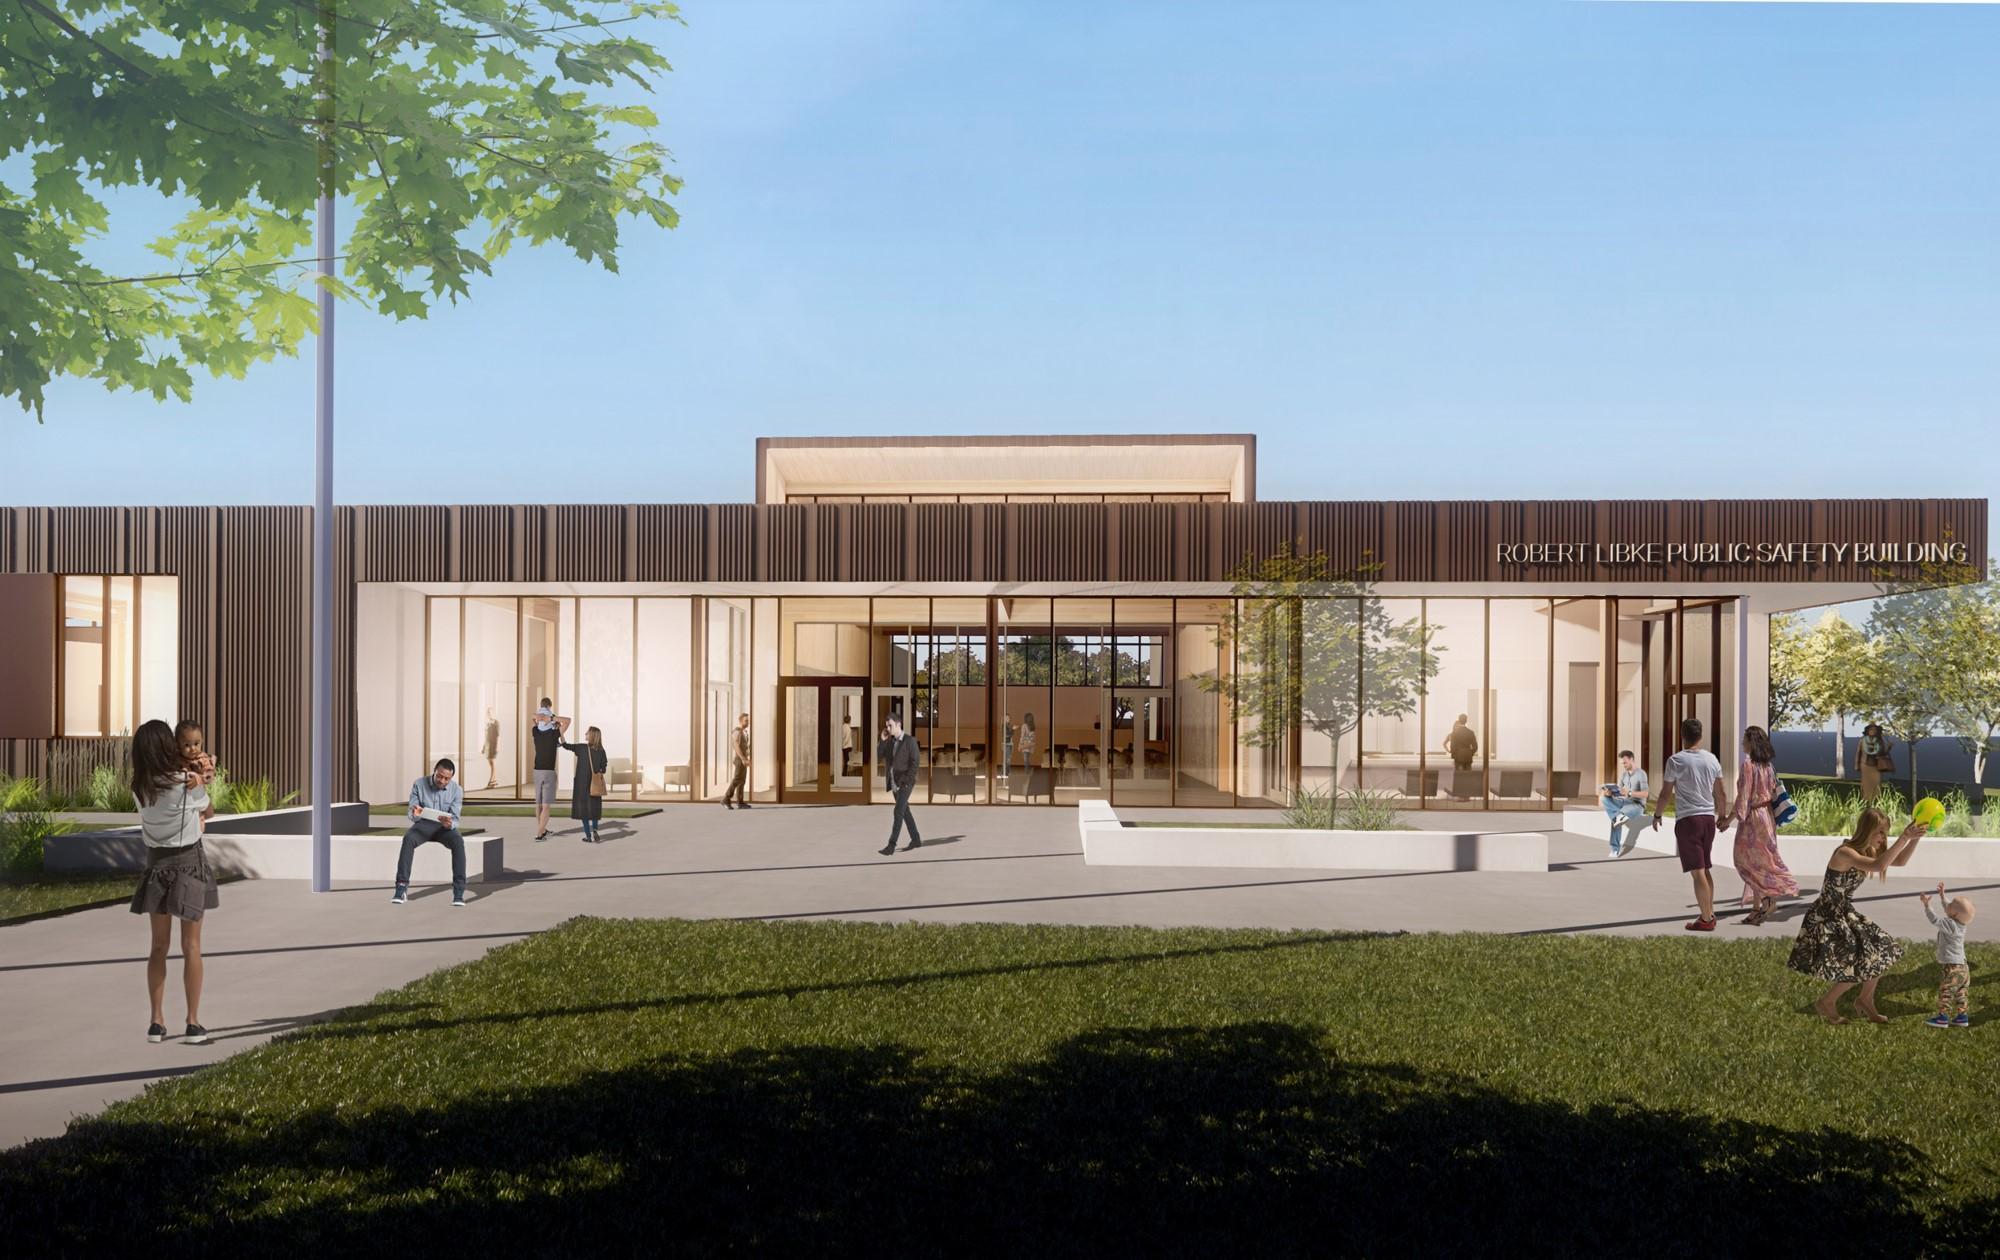 Robert Libke Public Safety Building